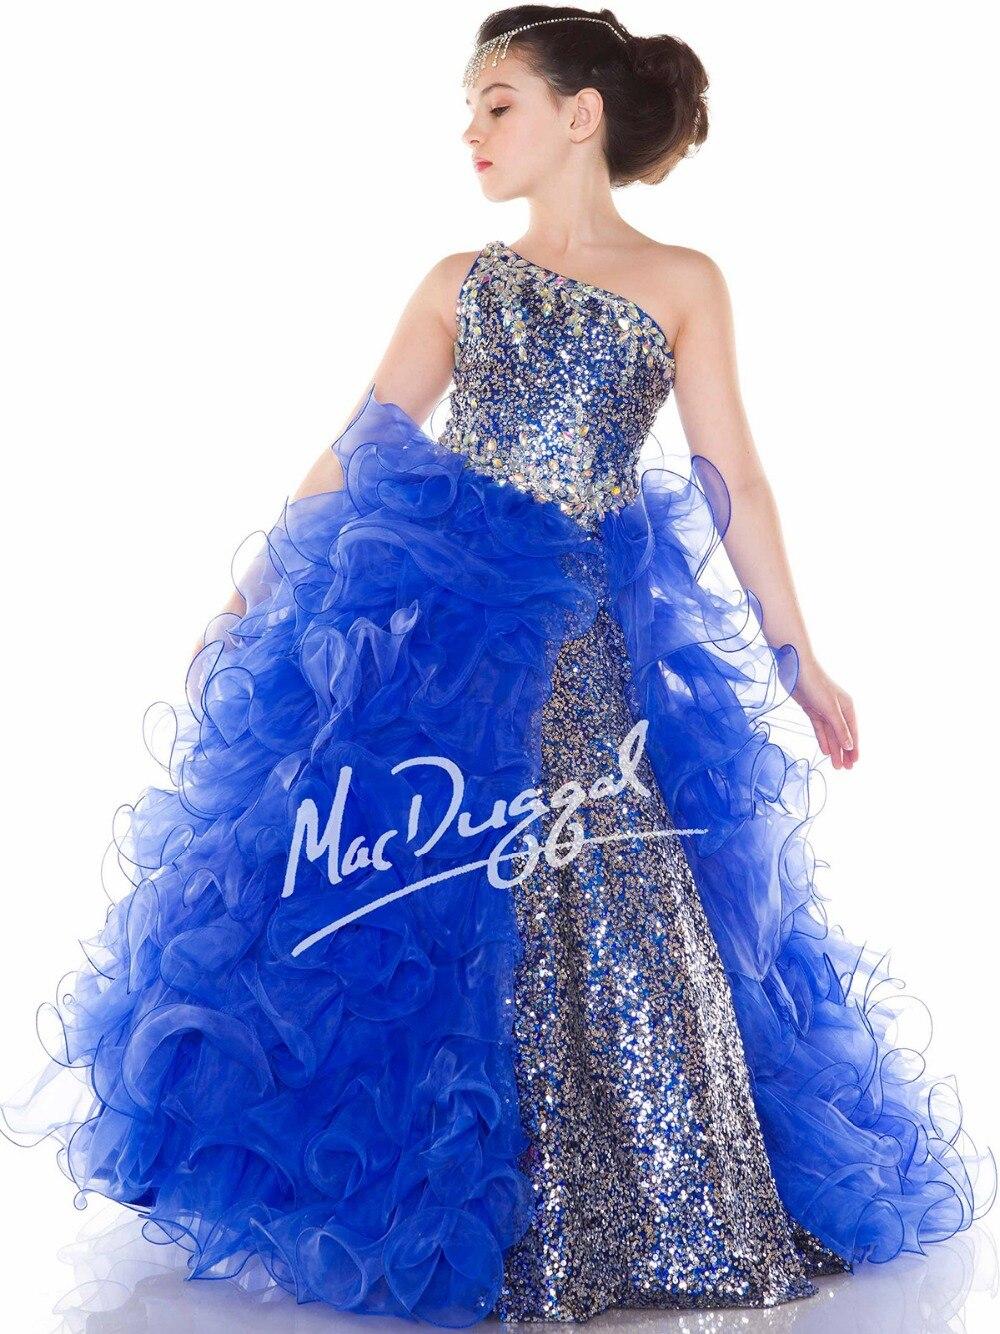 Bright White Blue One Shoulder Flower Girl Dresses Princess Dresses